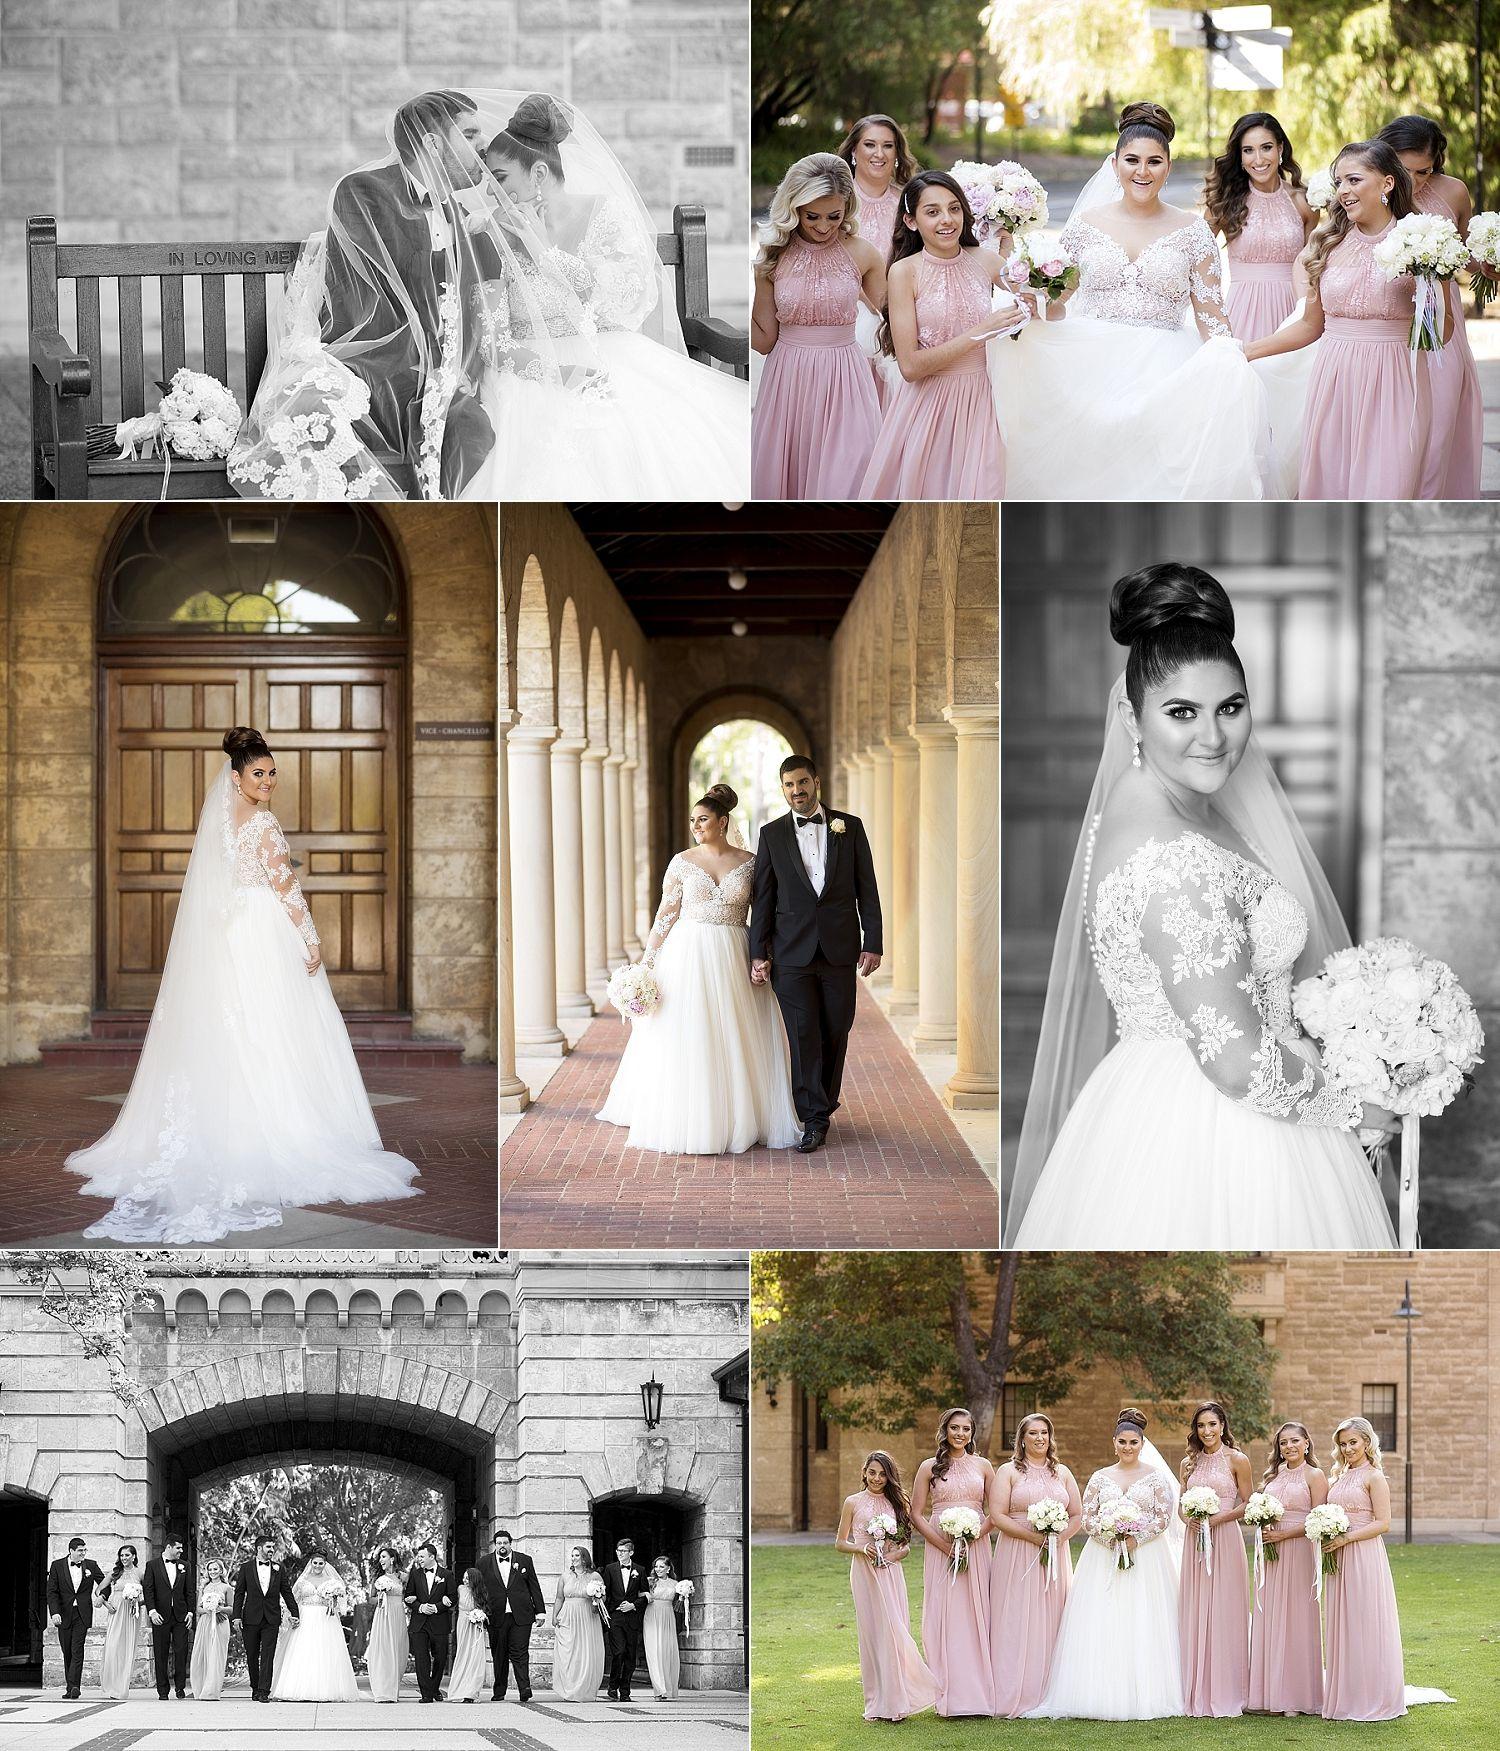 UWA wedding photos.JPG Wedding photos, Wedding